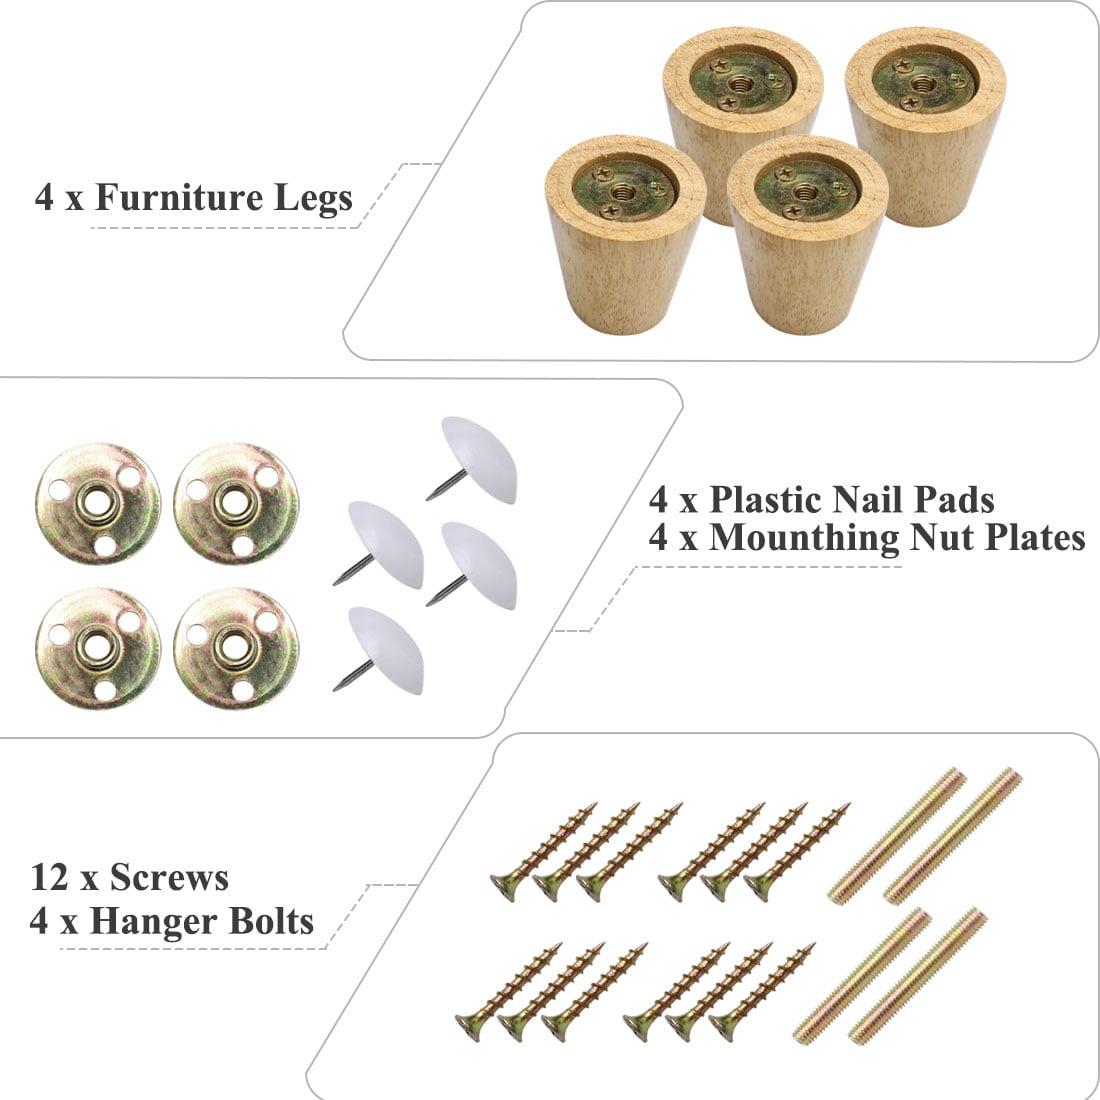 "2.4"" Round Solid Wood Furniture Leg Sofa Desk Feet Adjuster Replacement Set of 4 - image 5 de 7"